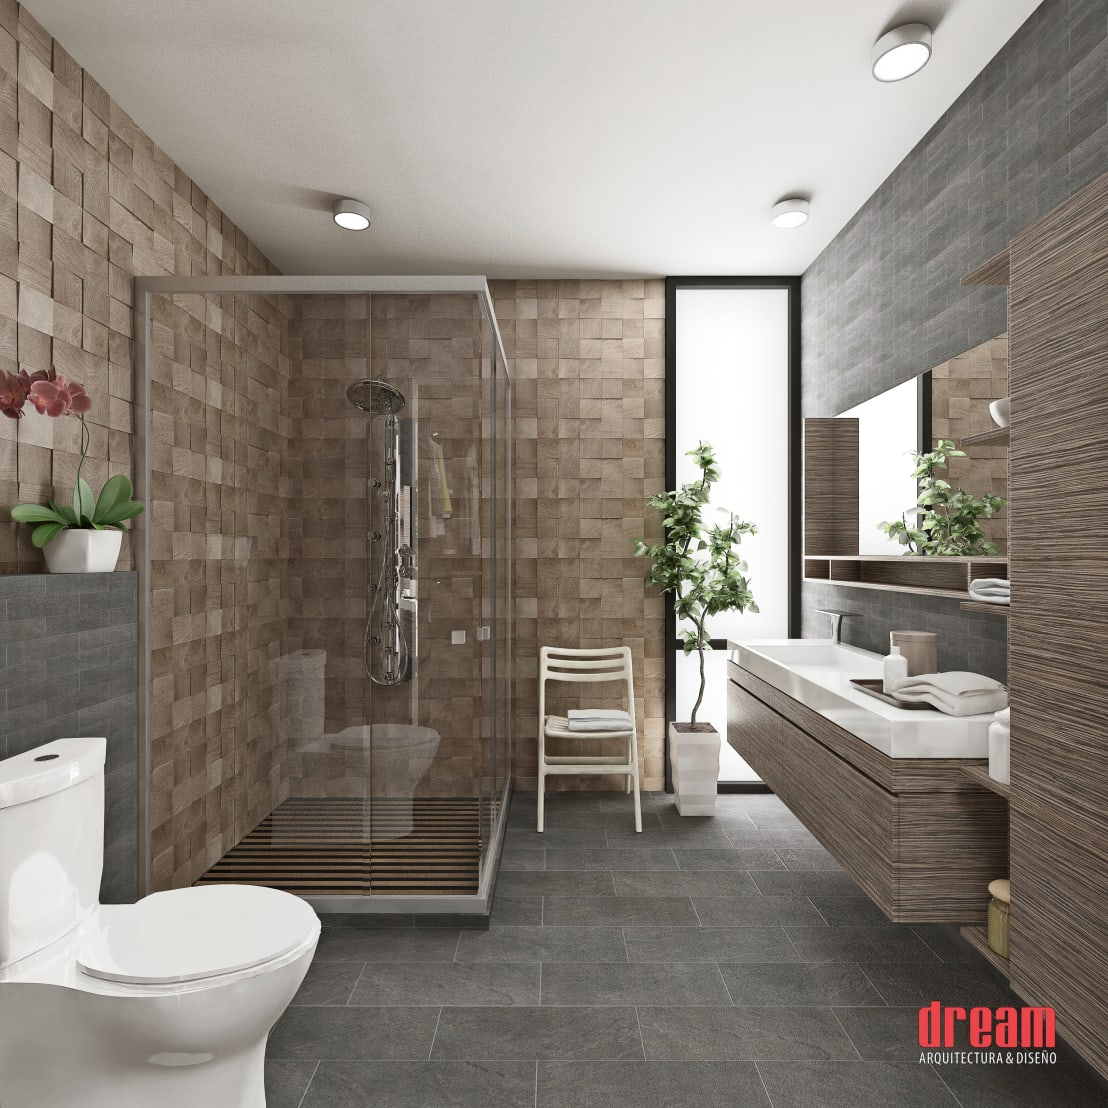 10 Cladding Ideas For Bathrooms